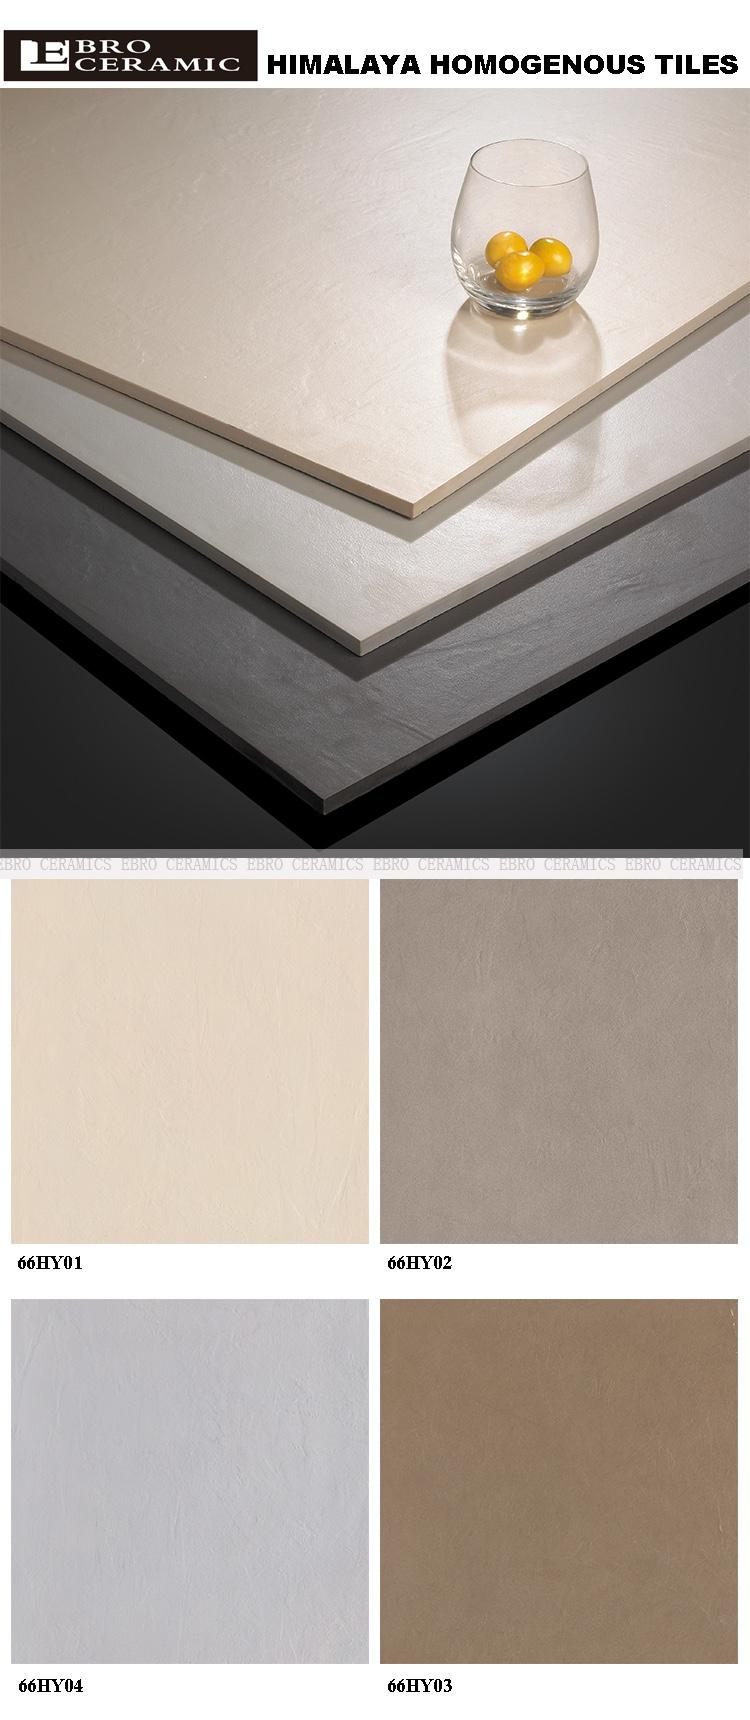 Homogenous Tile 60x60 : homogenous, 60x60, China, Factory, Matt/Lappato, Finish, Firebrick, Vietnam, Glazed, Rustic, Kitchen, Cement, Ceramic, Floor, 30x60, 66EK02,, Tile,, CERAMIC, Product, Details, Foshan